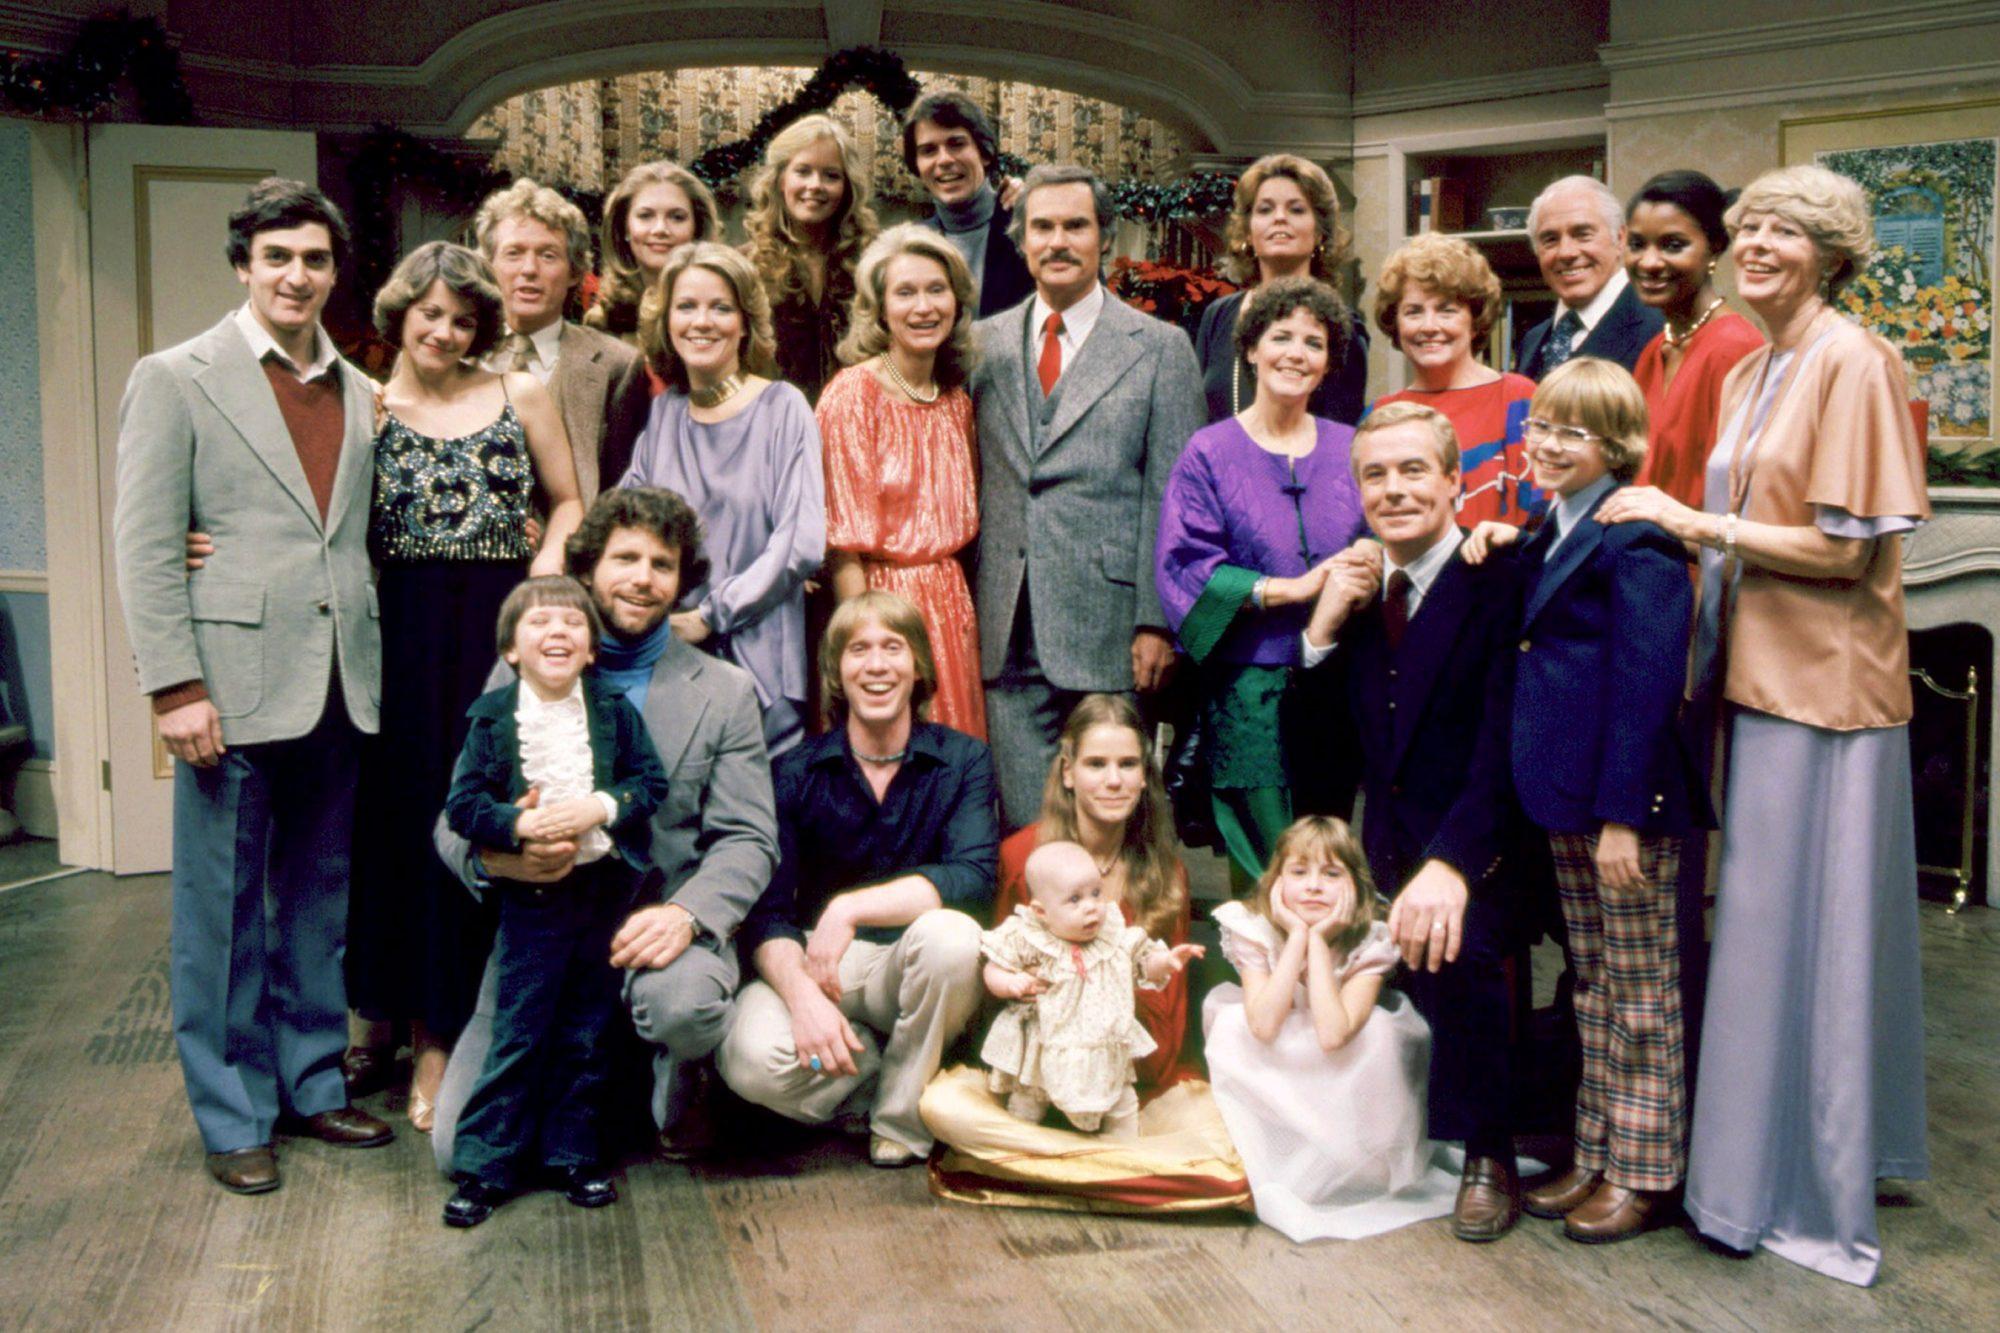 THE DOCTORS, (ca. mid-1970s), 1963-82.